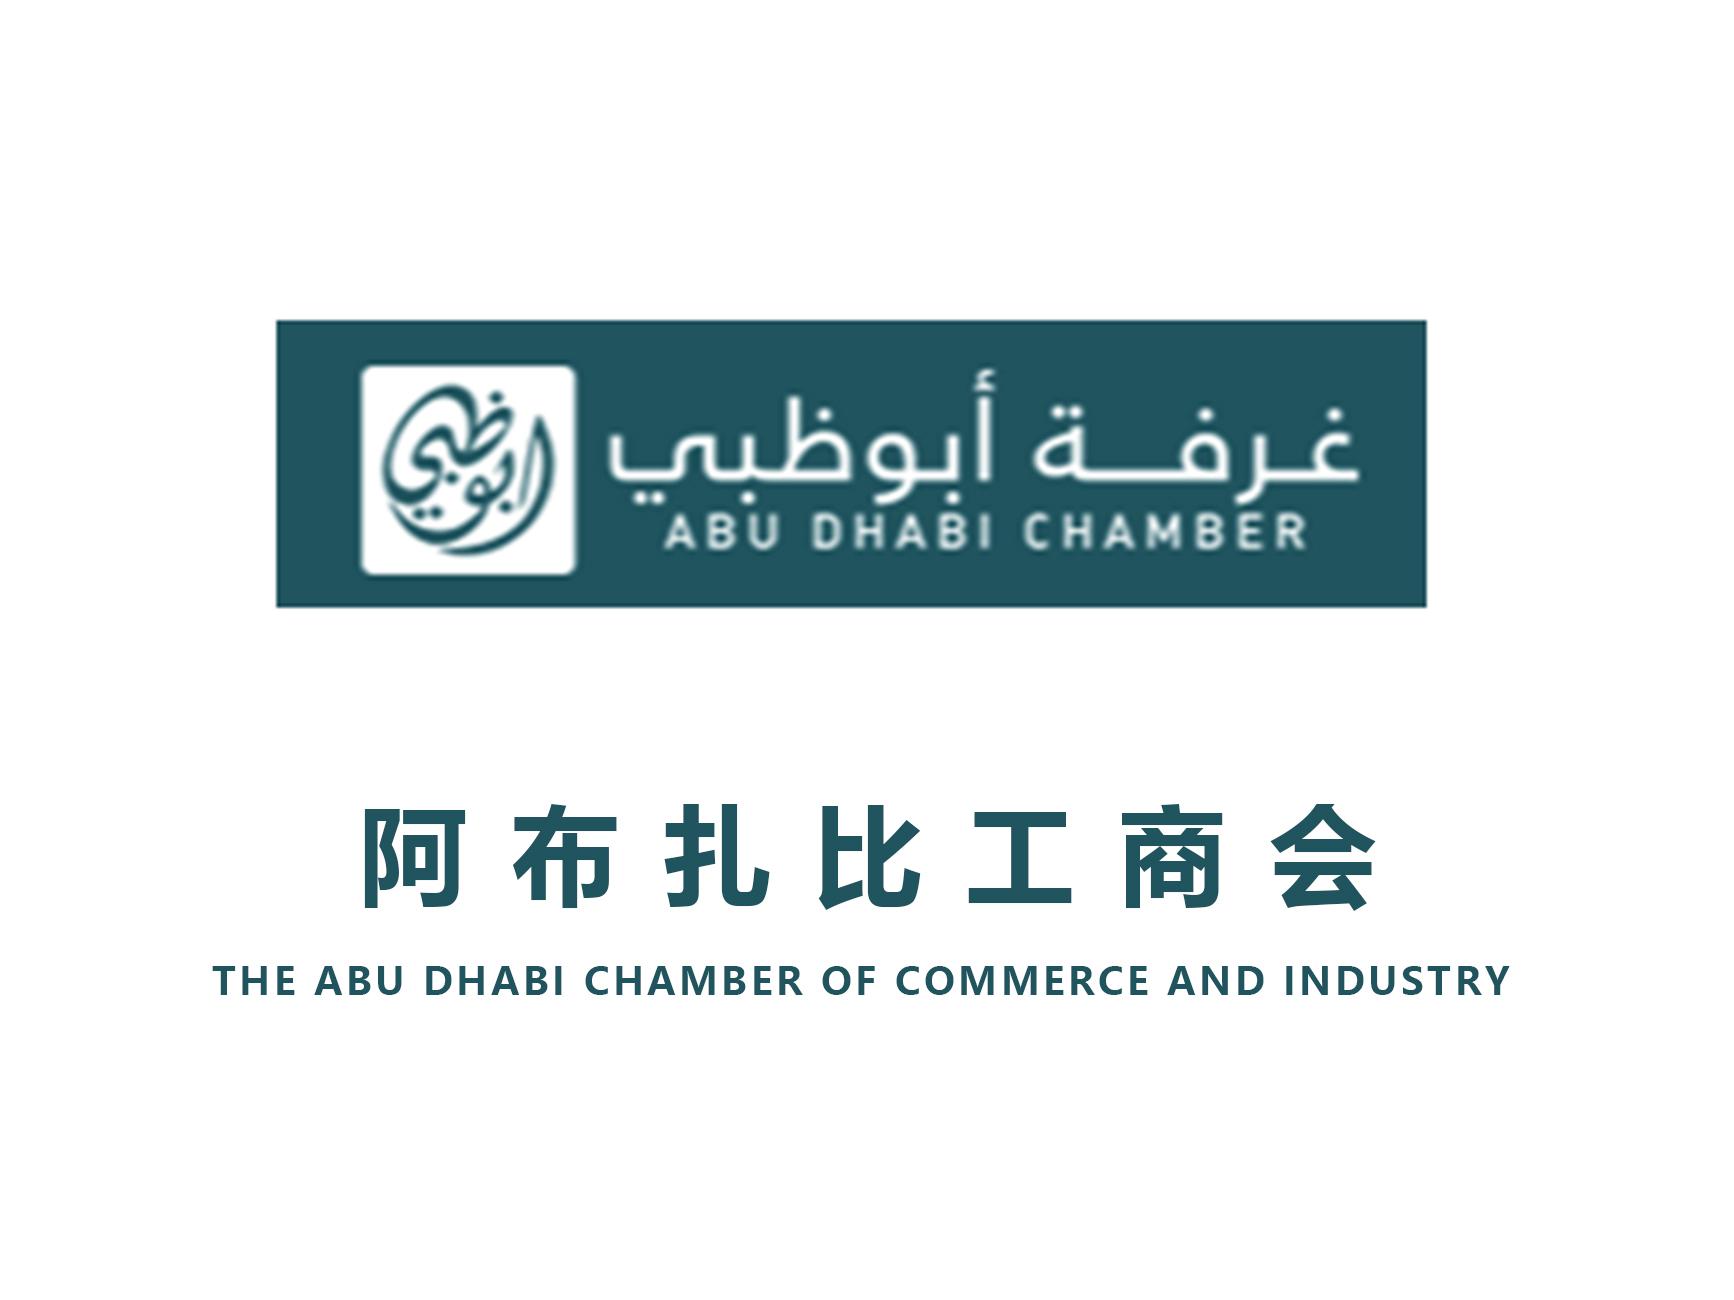 阿布扎比工商会/ABDhabi Chamber